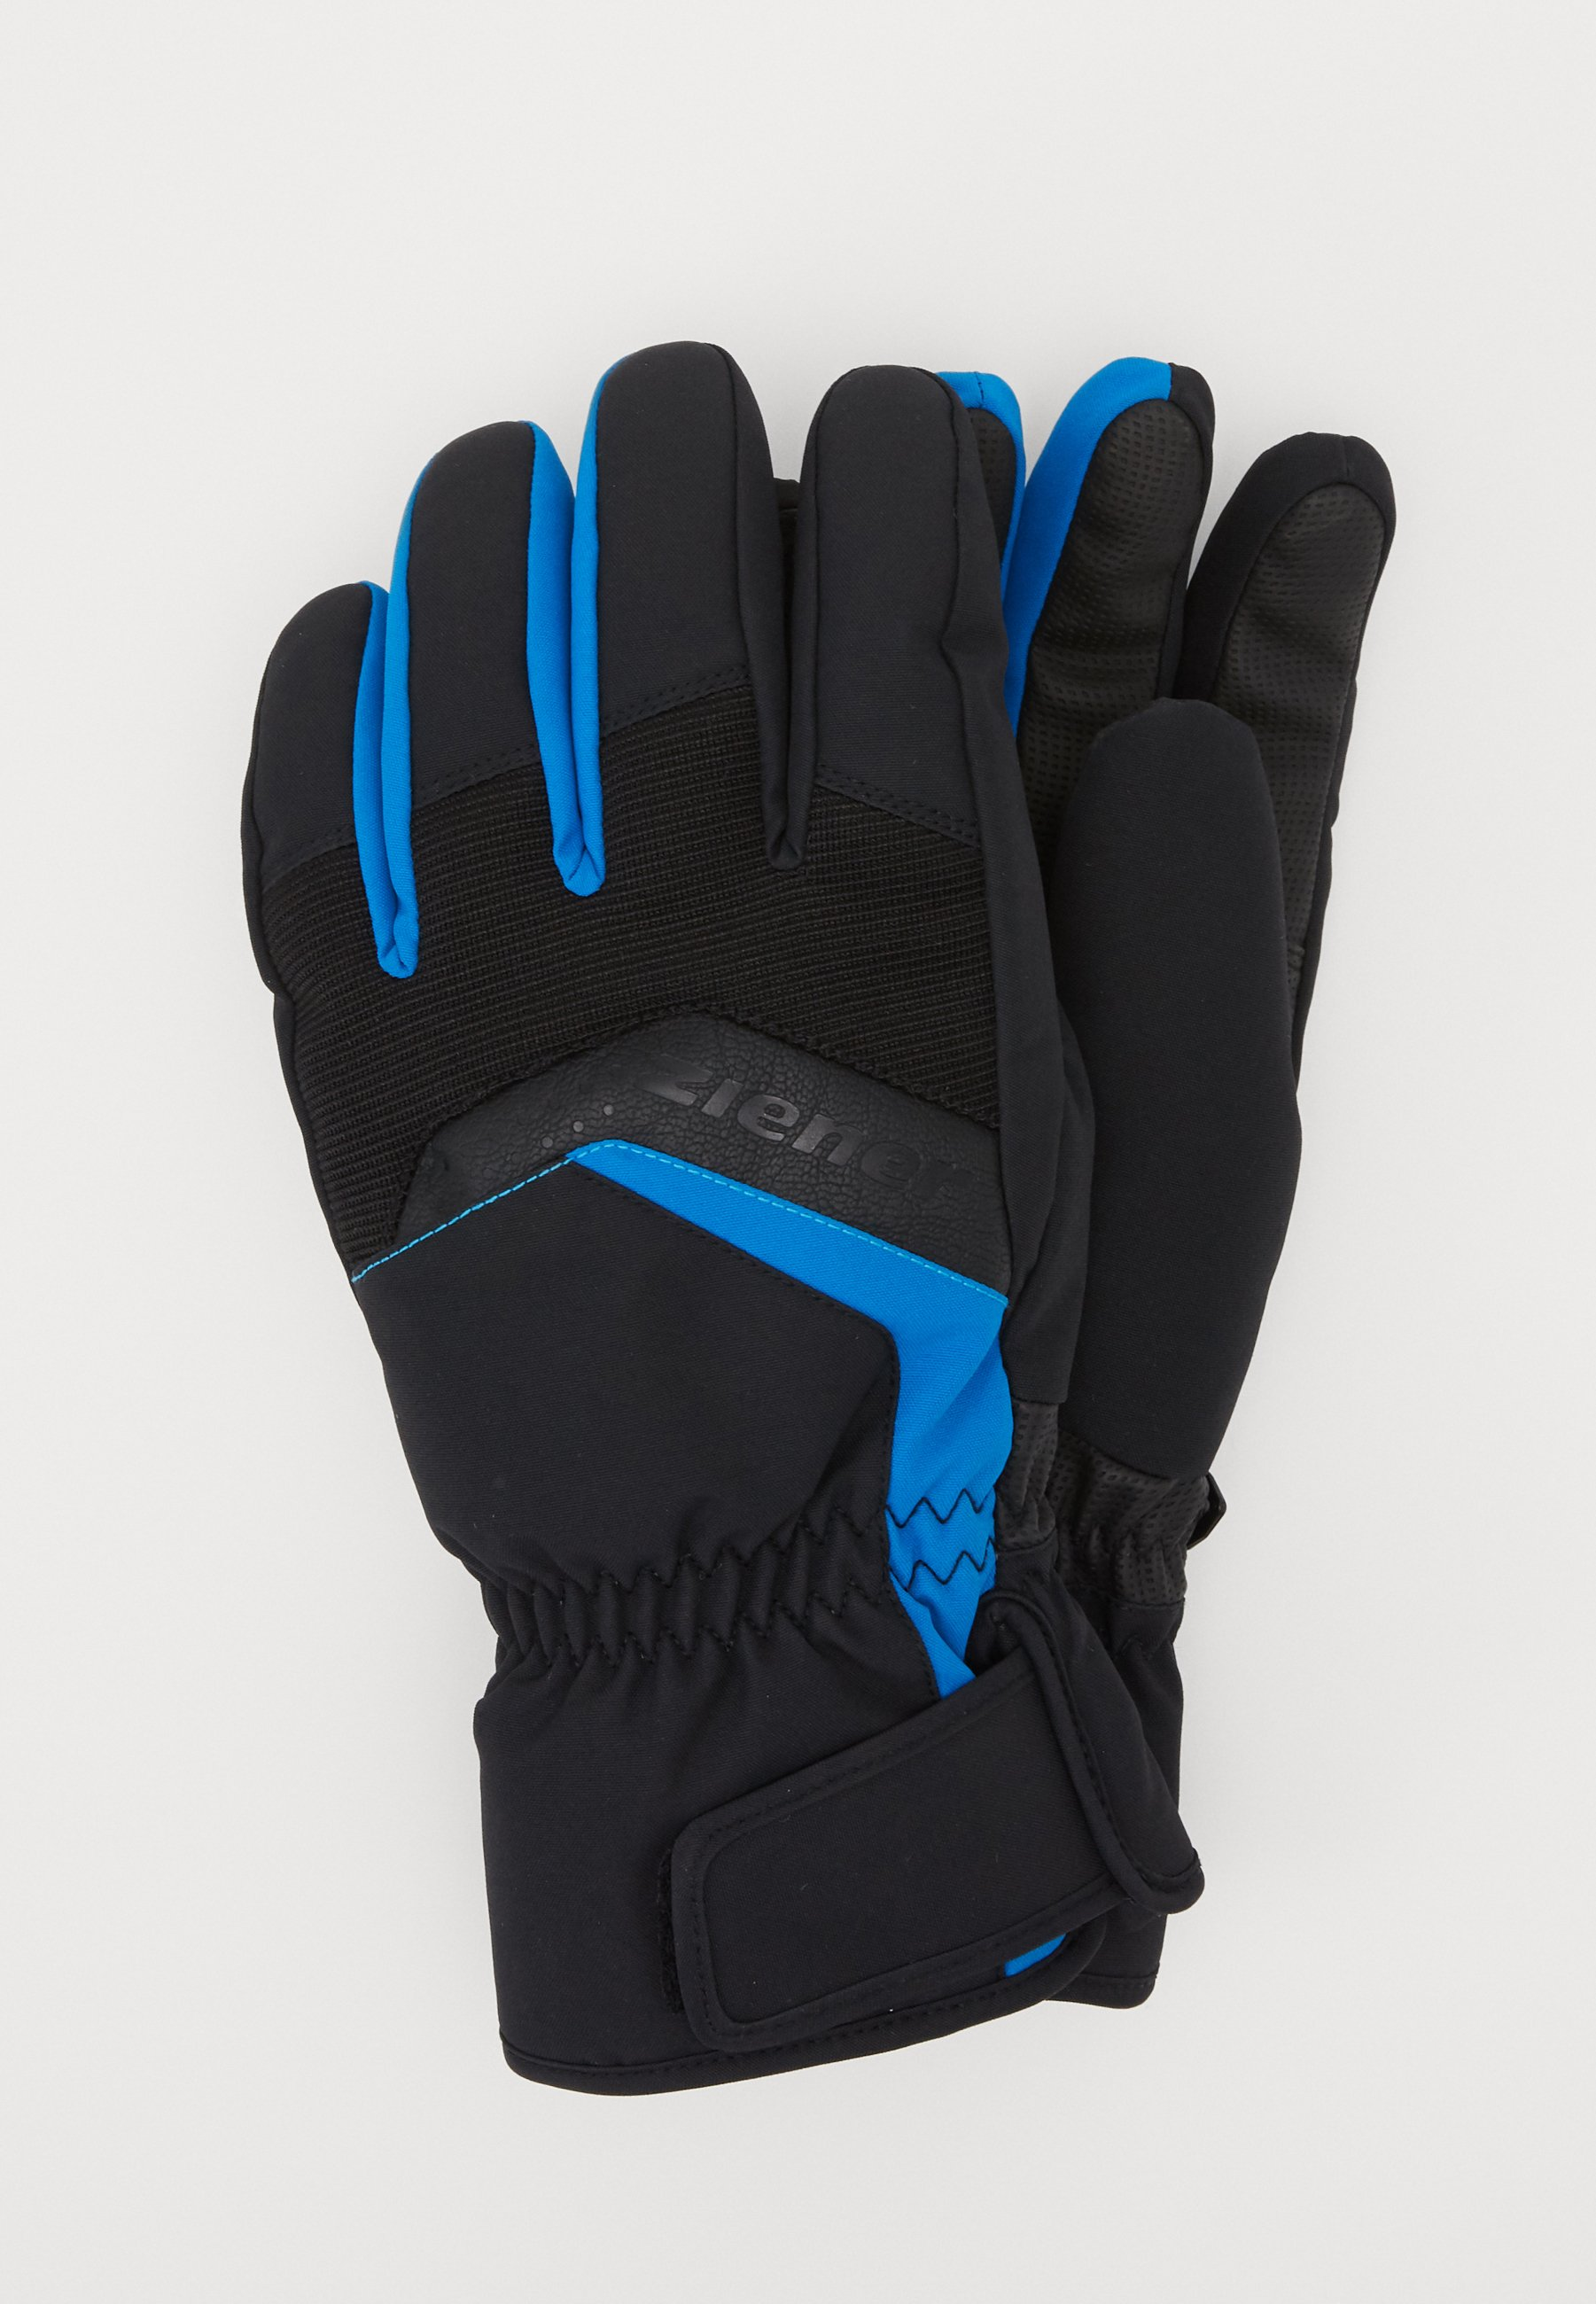 Men GABINO GLOVE SKI ALPINE - Gloves